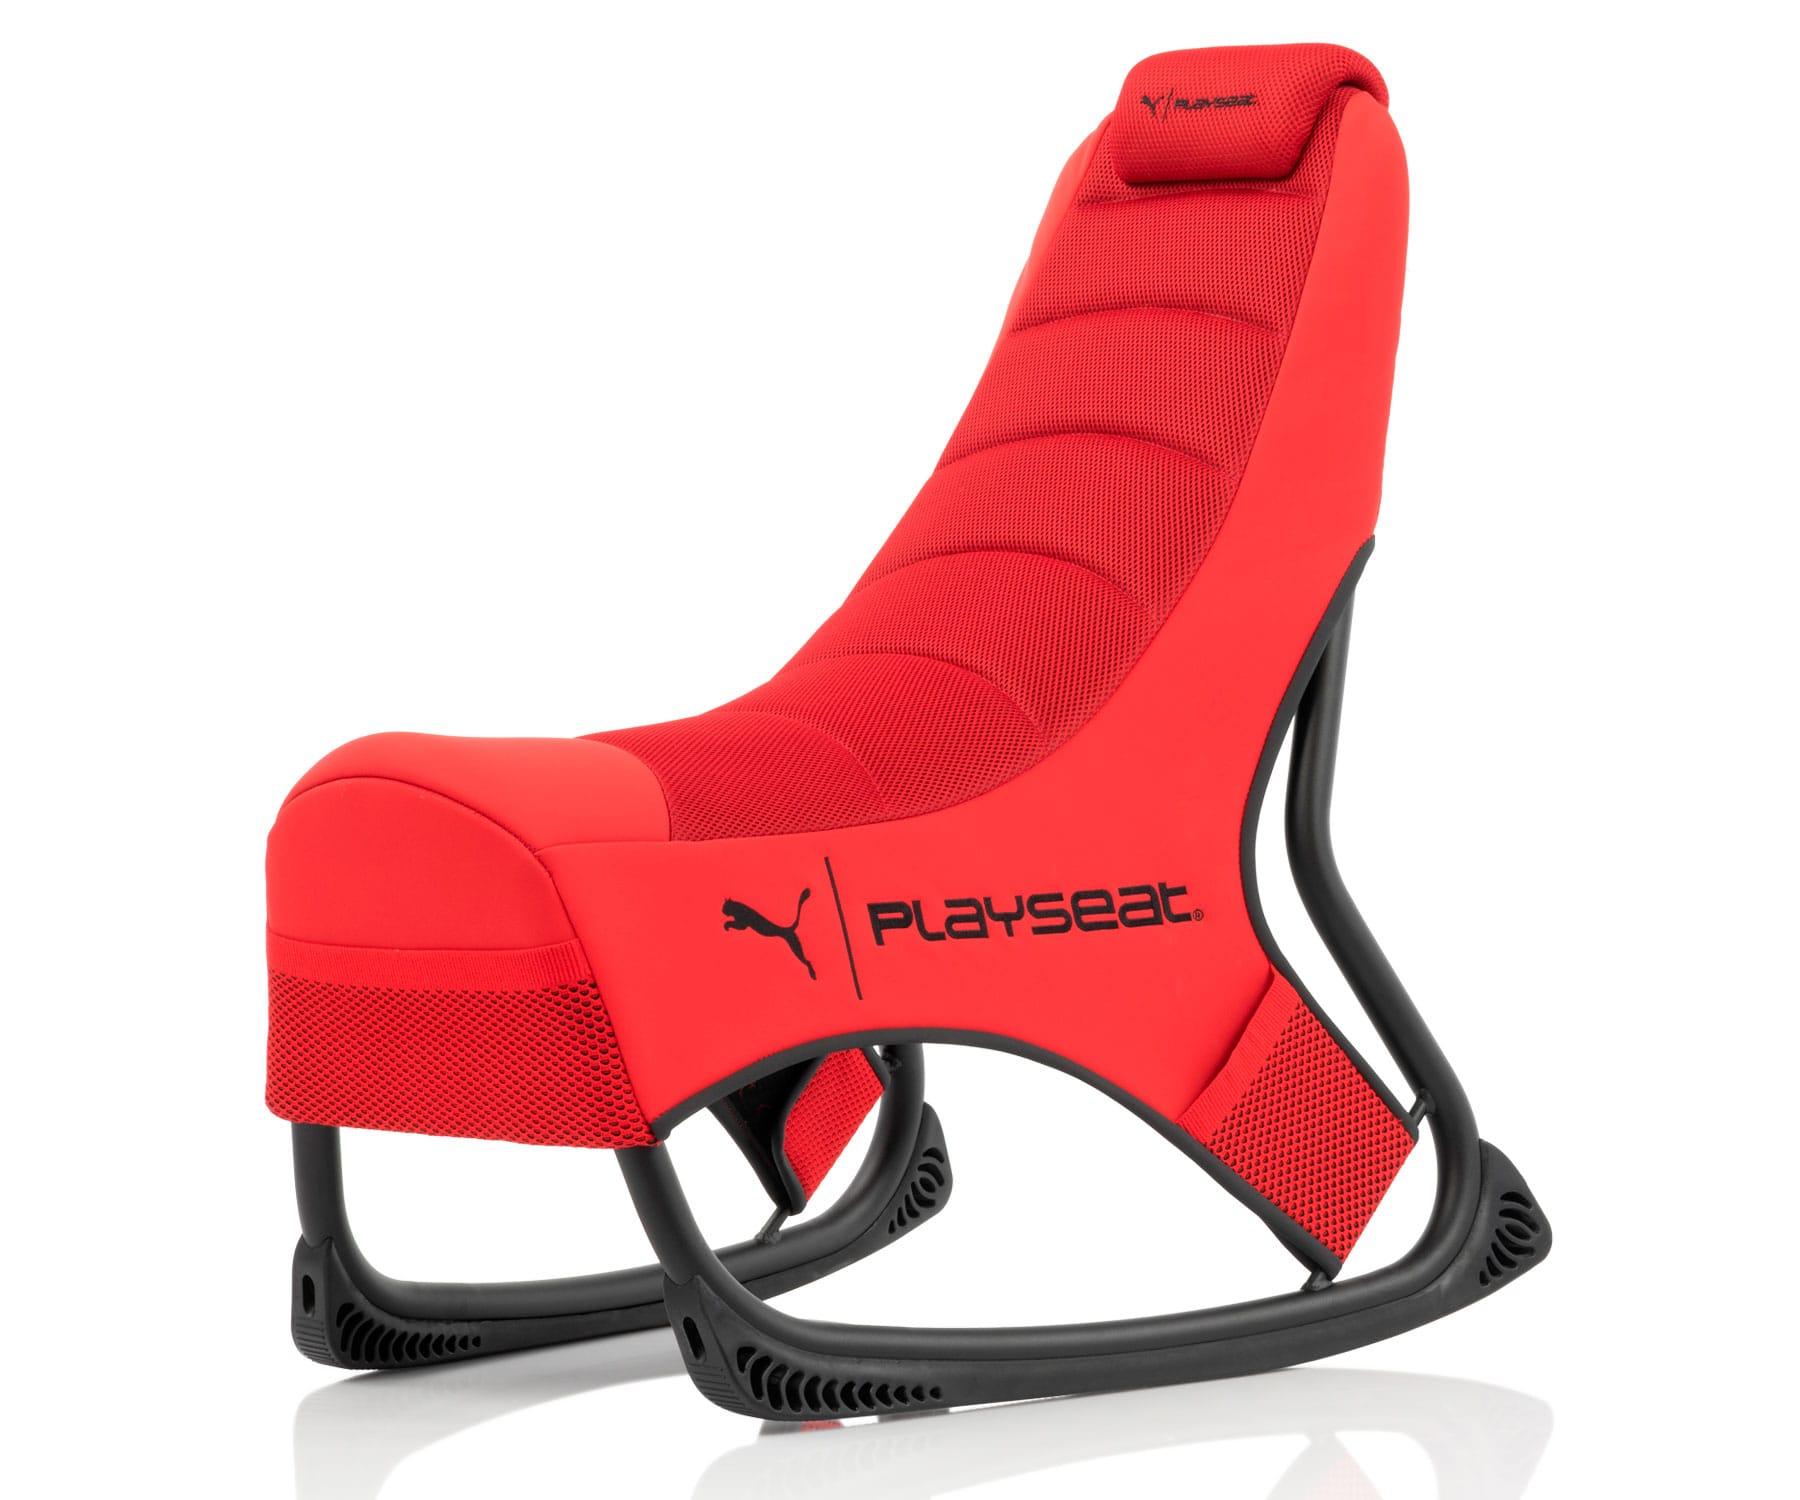 PLAYSEAT PUMA GAME SEAT  SILLA GAMING ROJA/LIBERTAD DE MOVIMIENTO